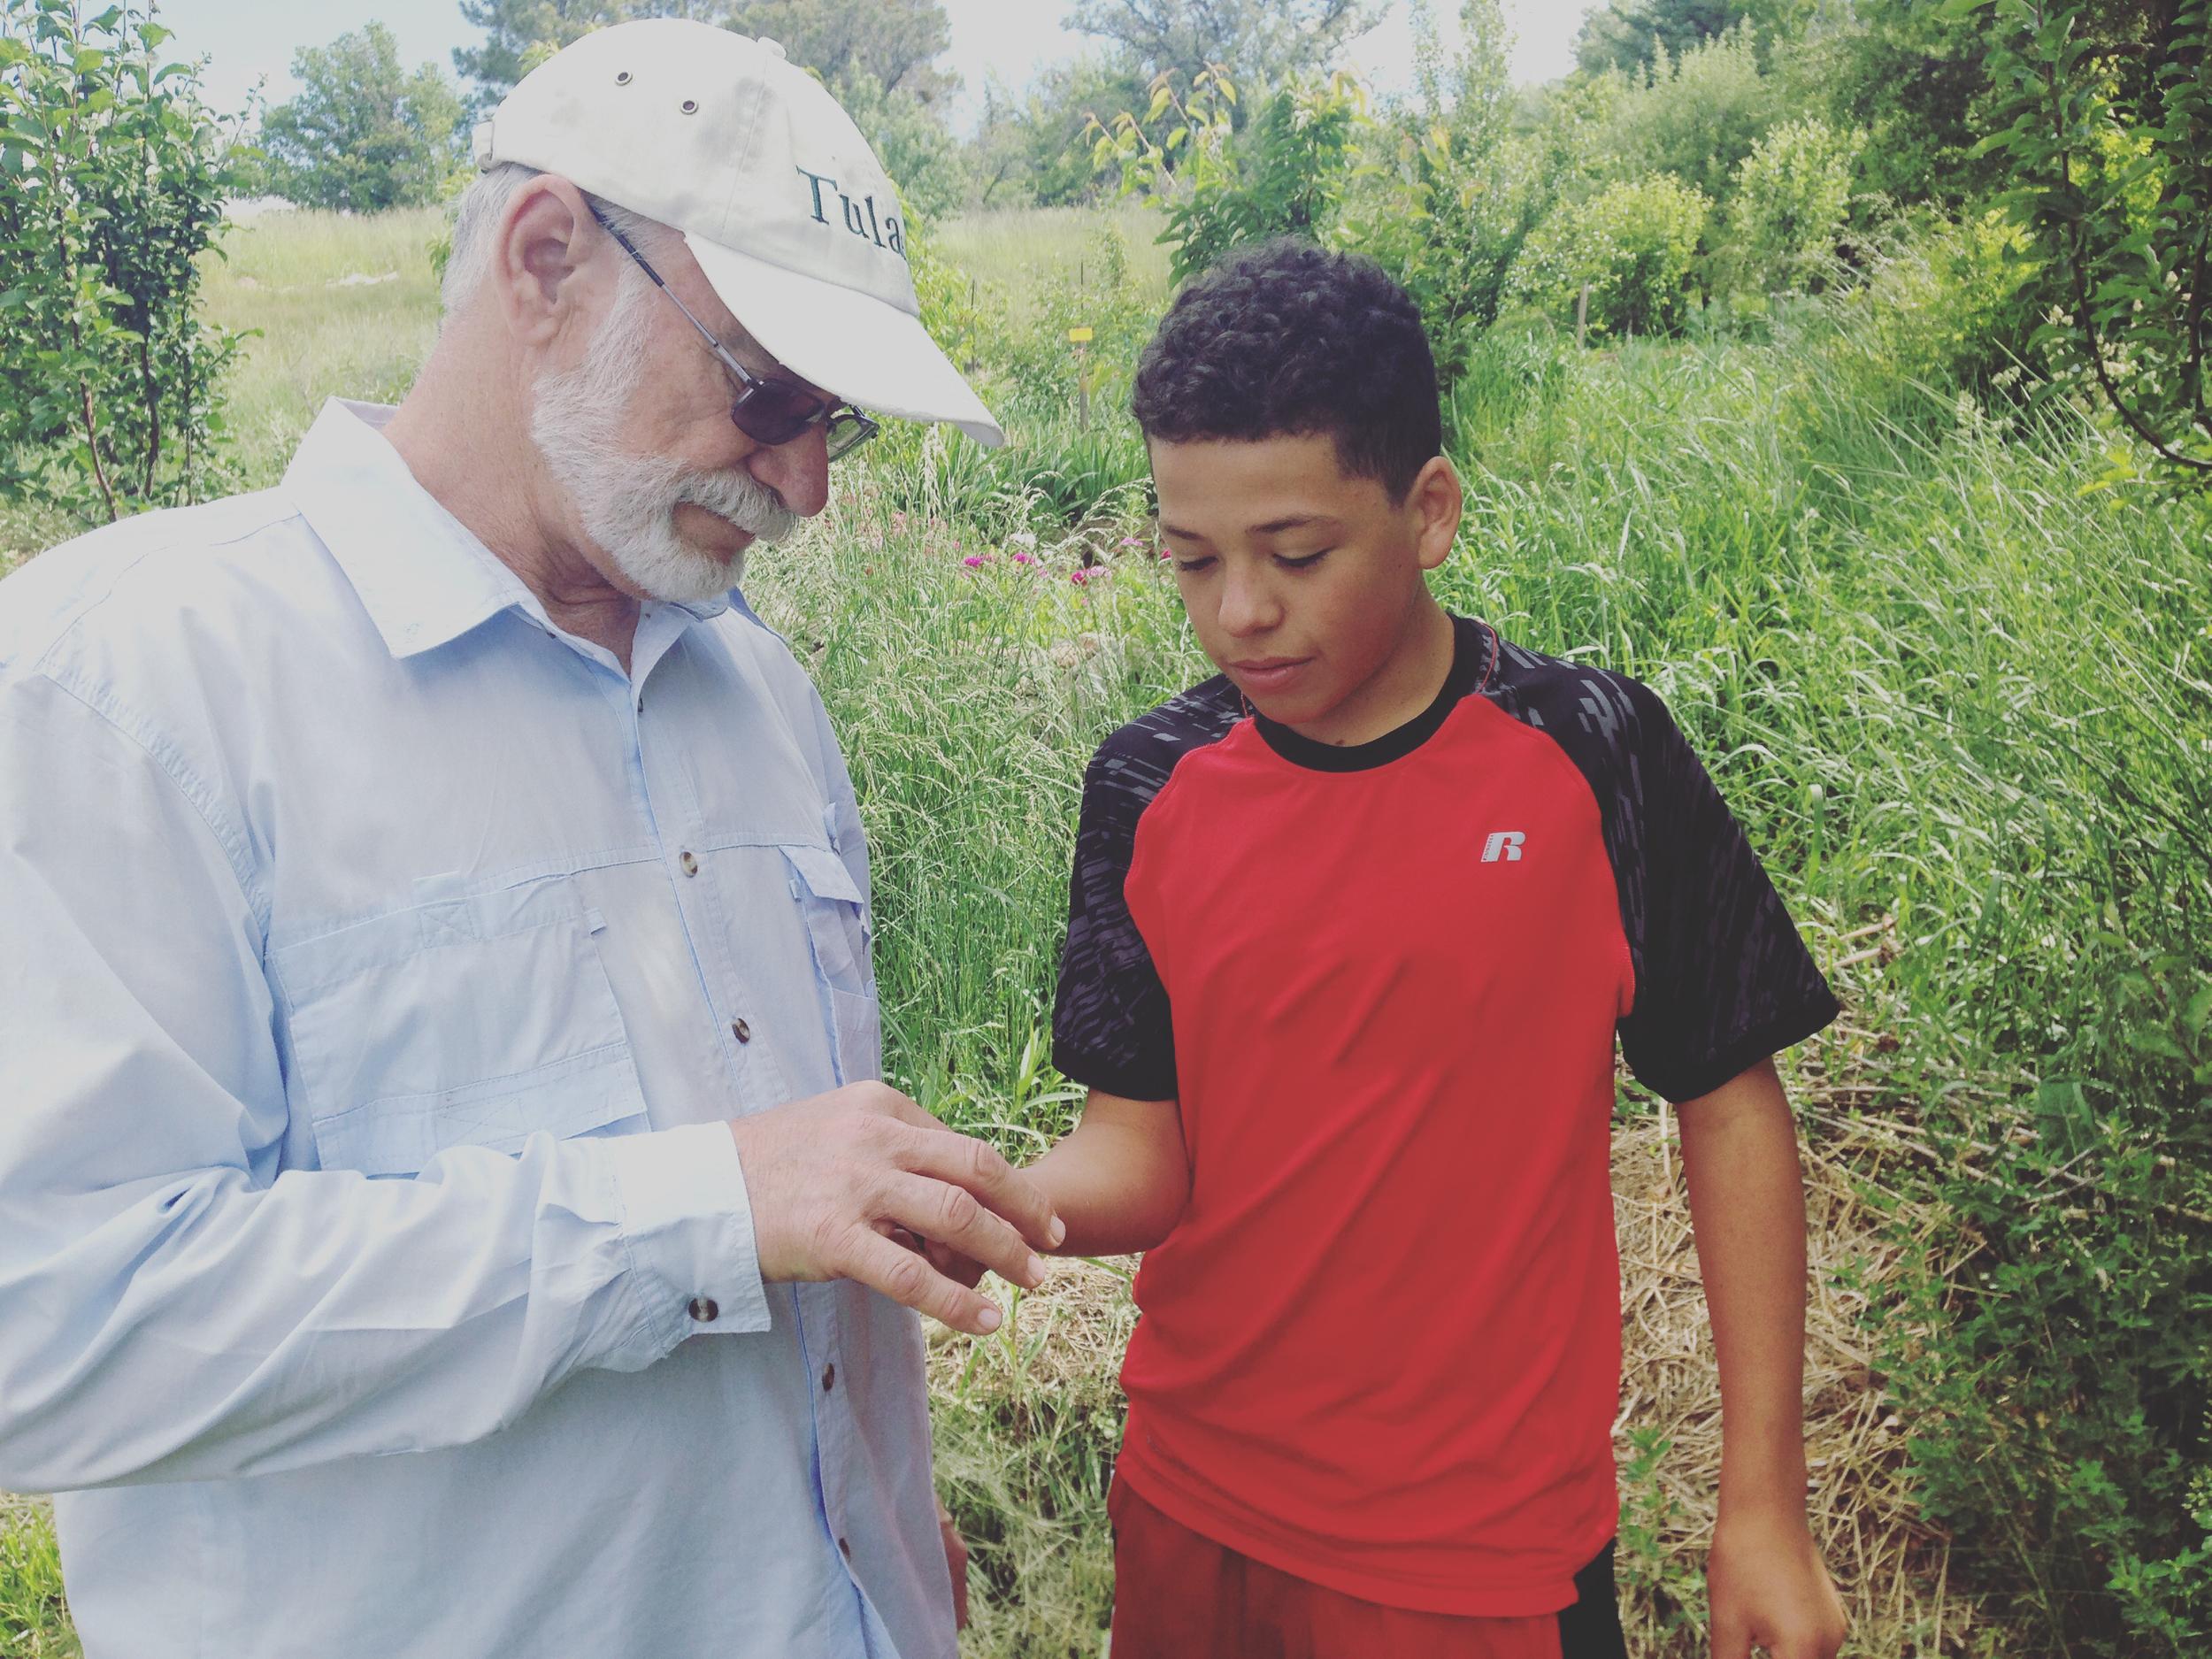 Mr Hoodless helps a student identify a macroinvertebrate